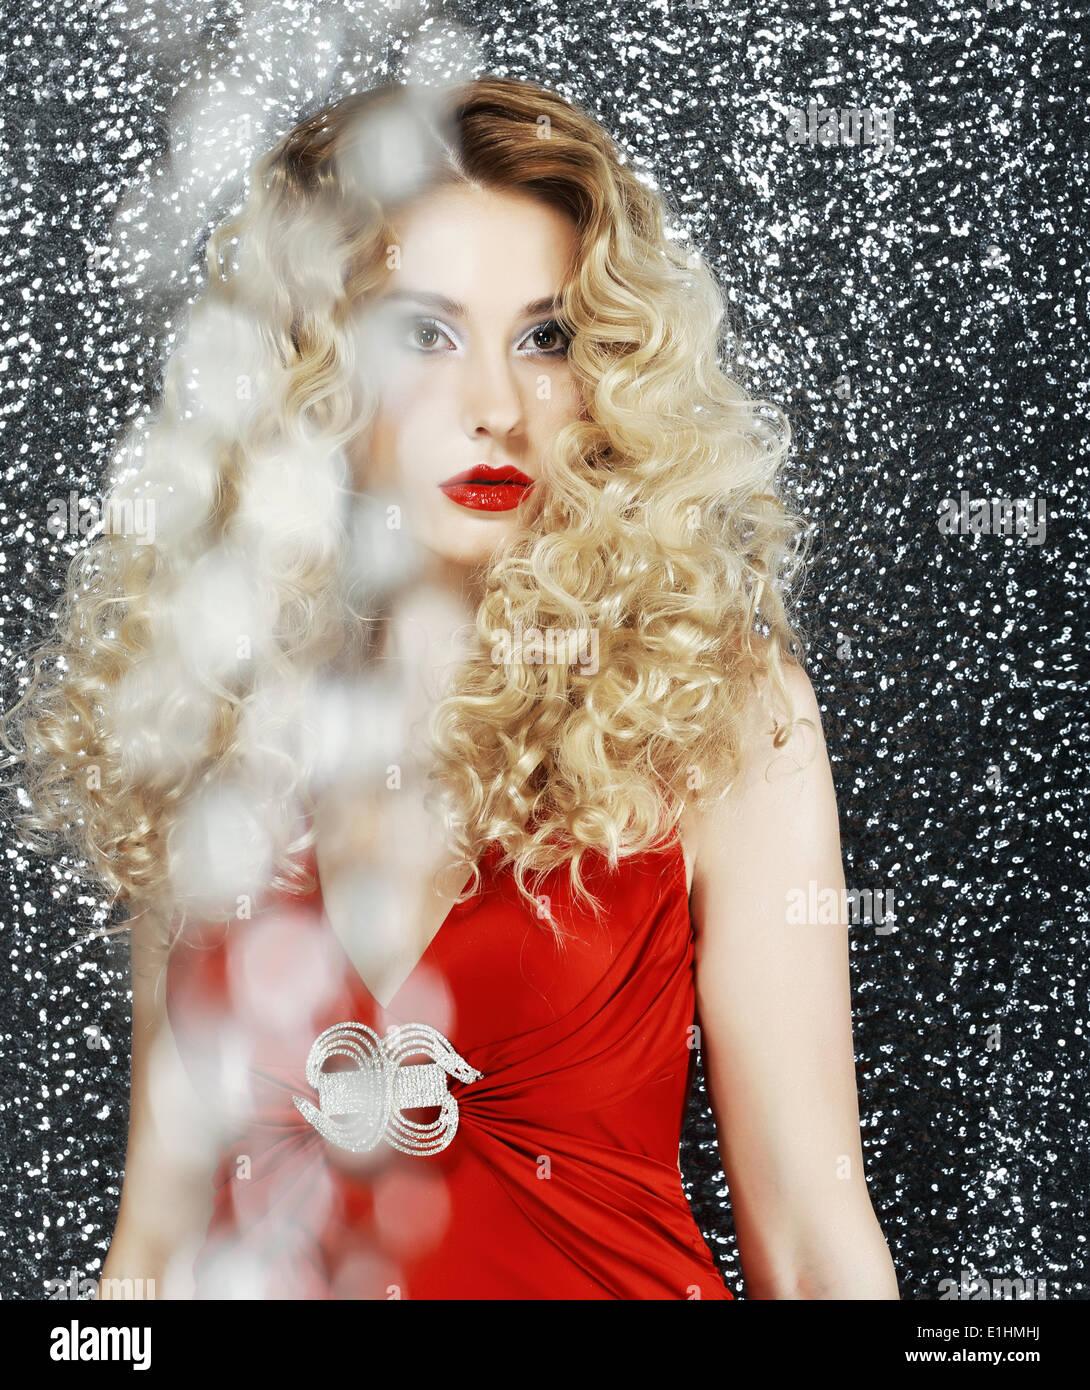 Encanto. Mujer - Elegante brillante Glitter. Magnetismo Imagen De Stock